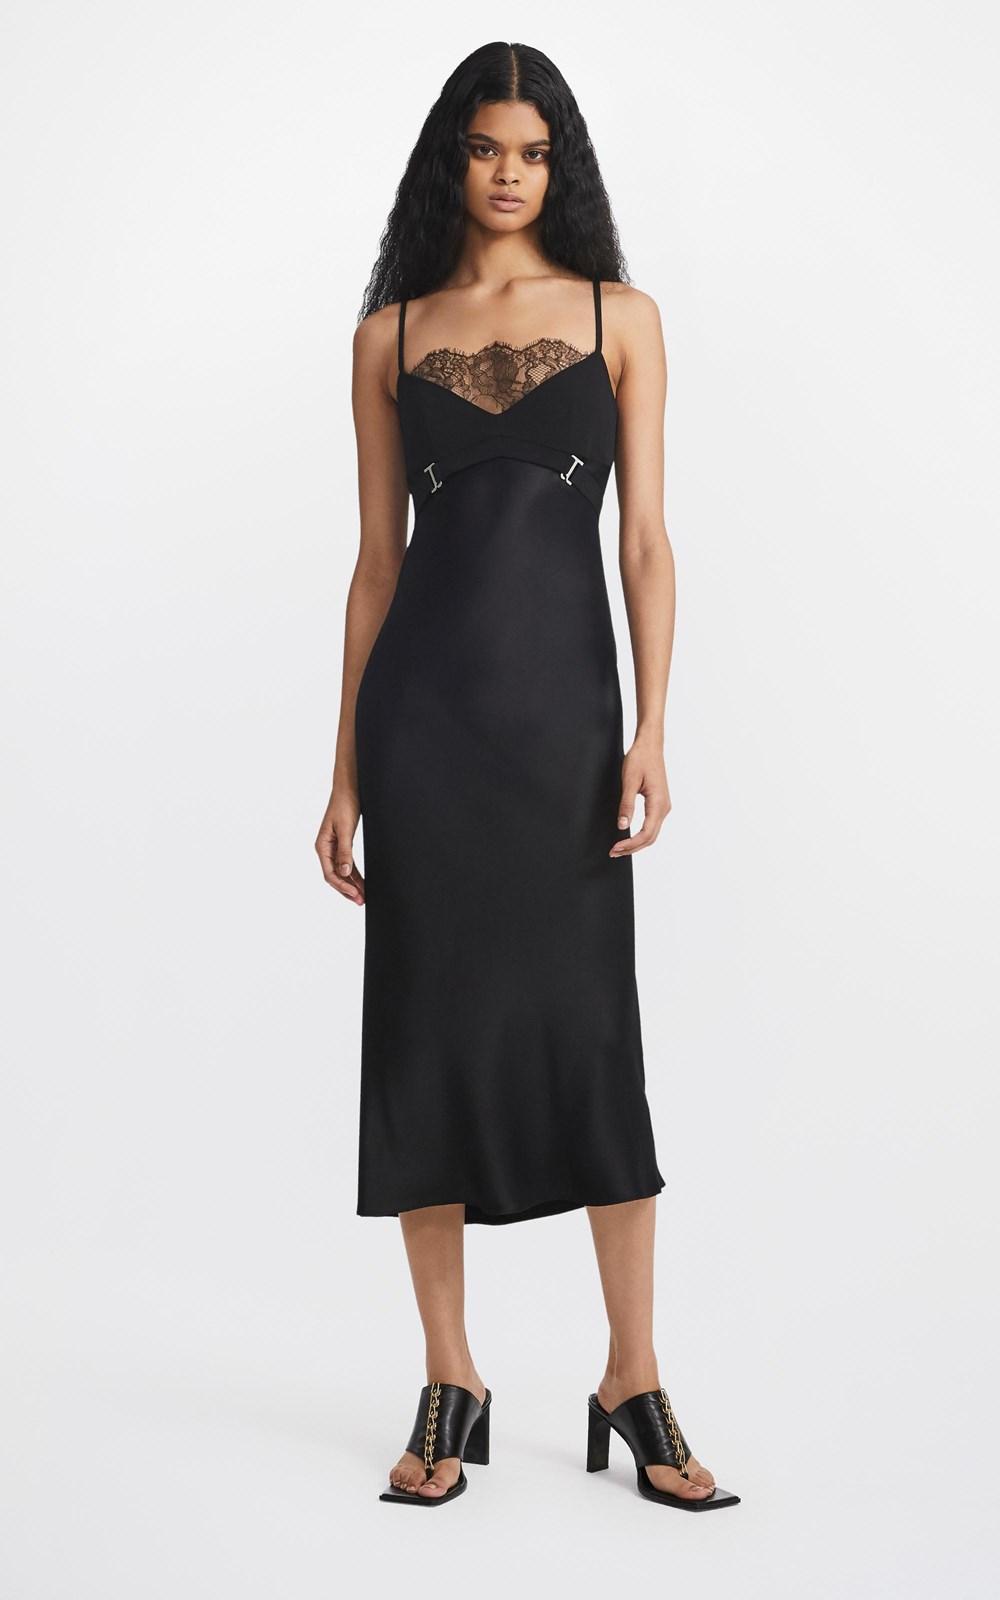 Dresses | LACE E-HOOK HARNESS SLIP DRESS